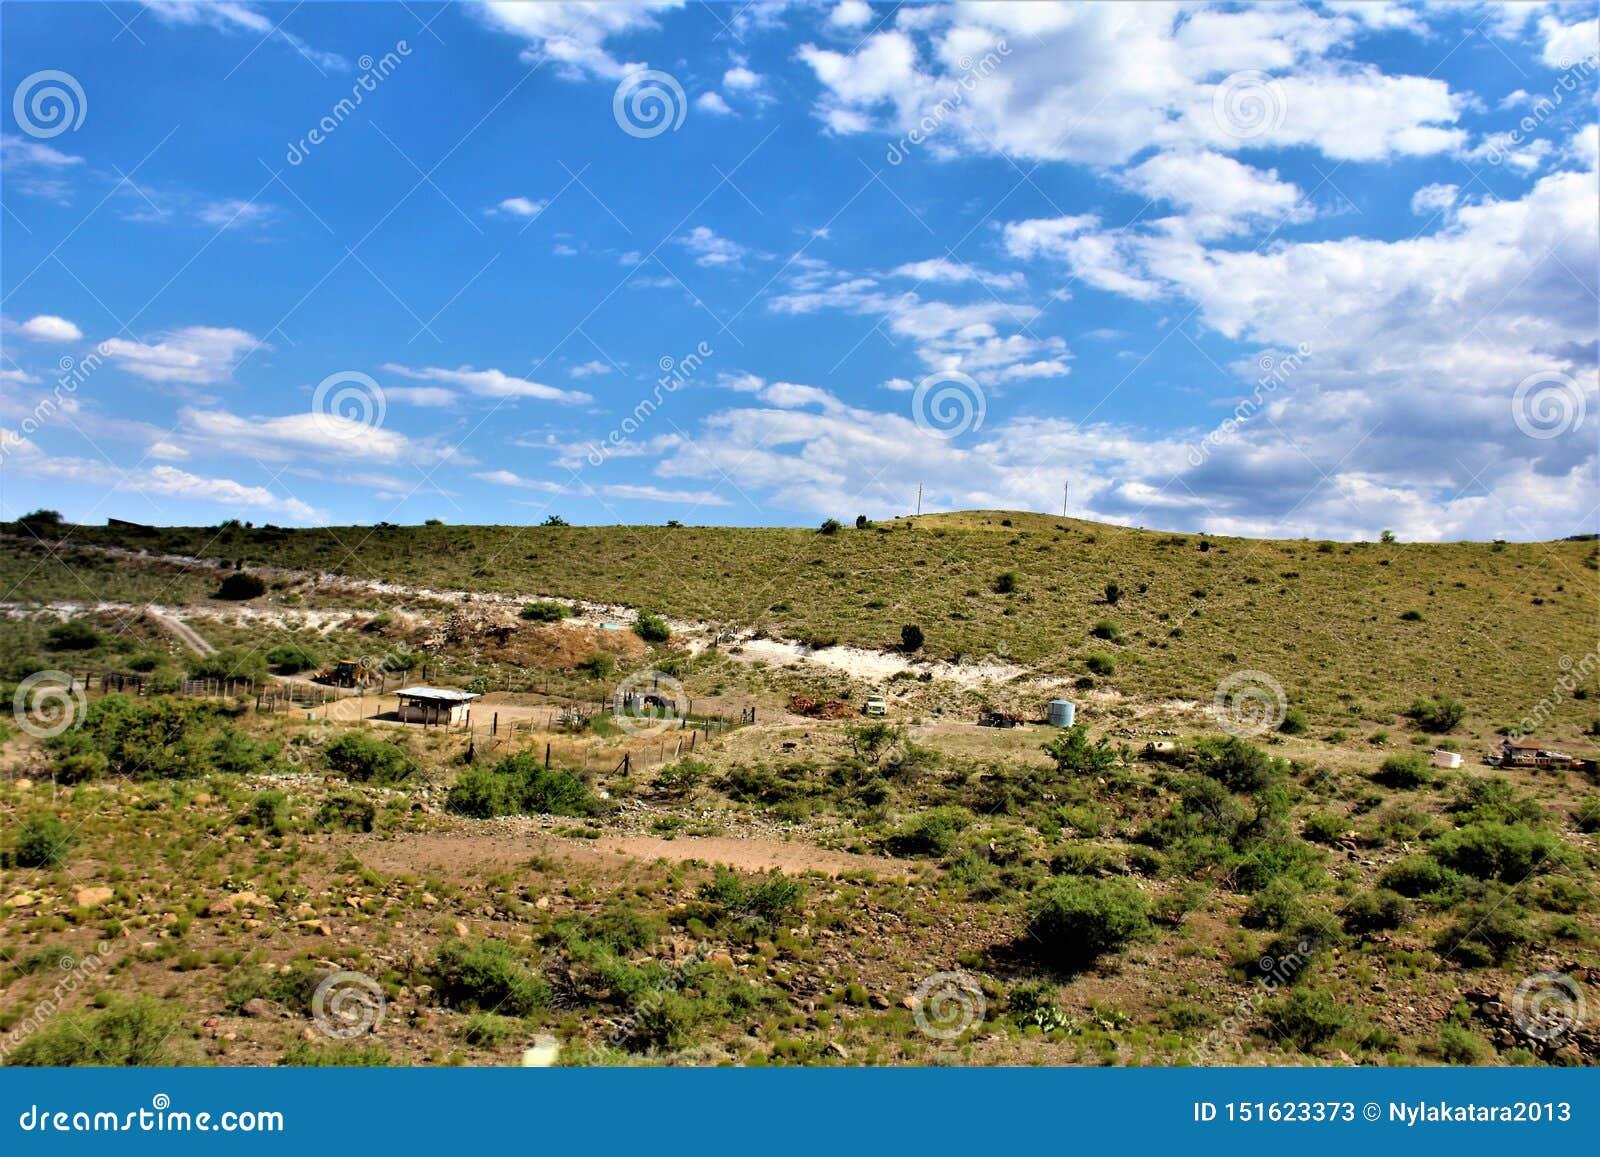 Landscape scenery Jerome and Phoenix, Maricopa County, Arizona, United States